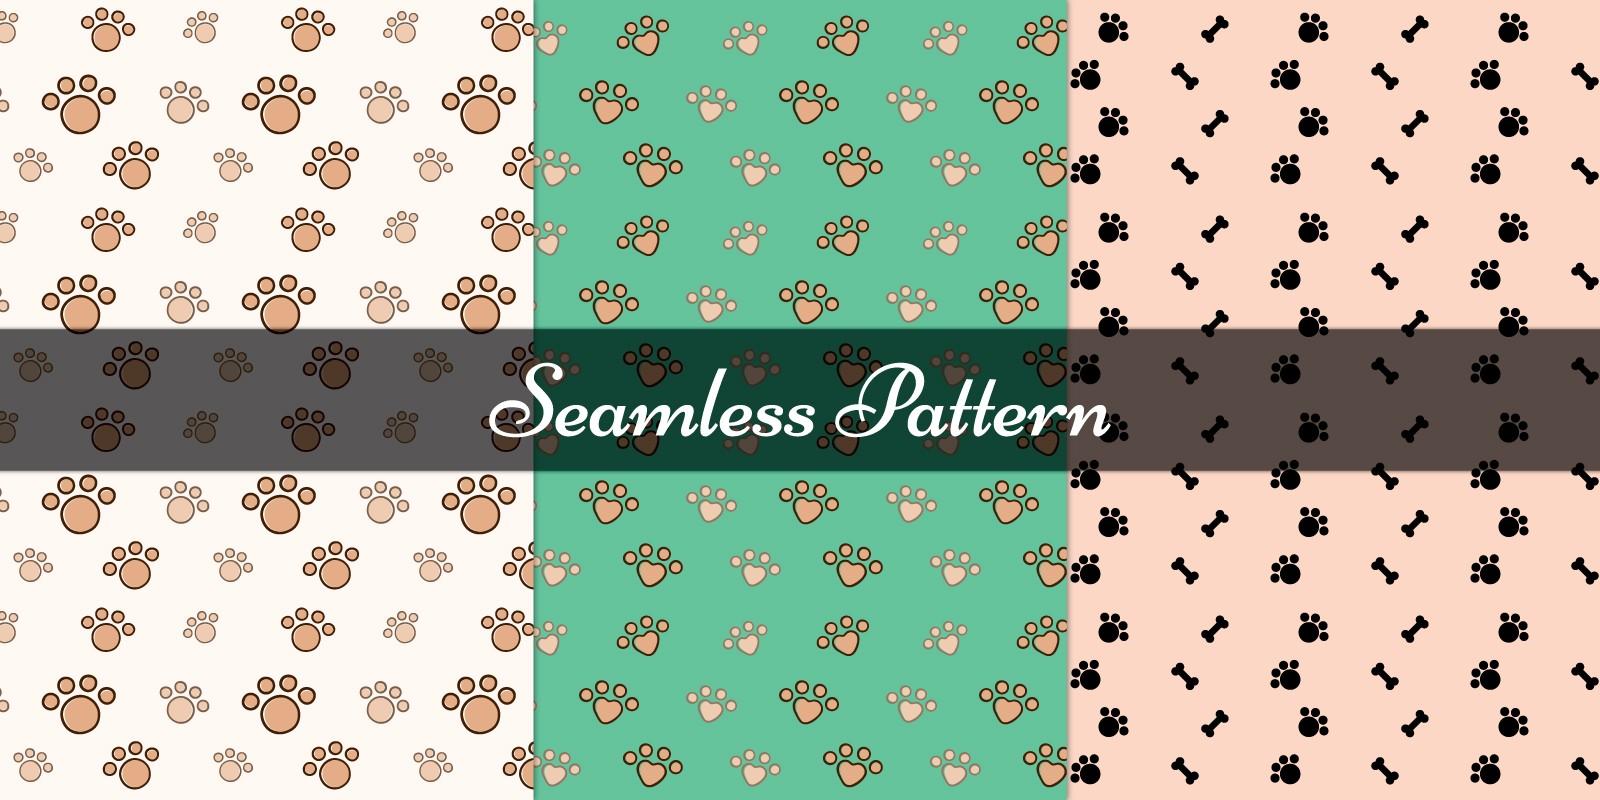 Paw Patterns